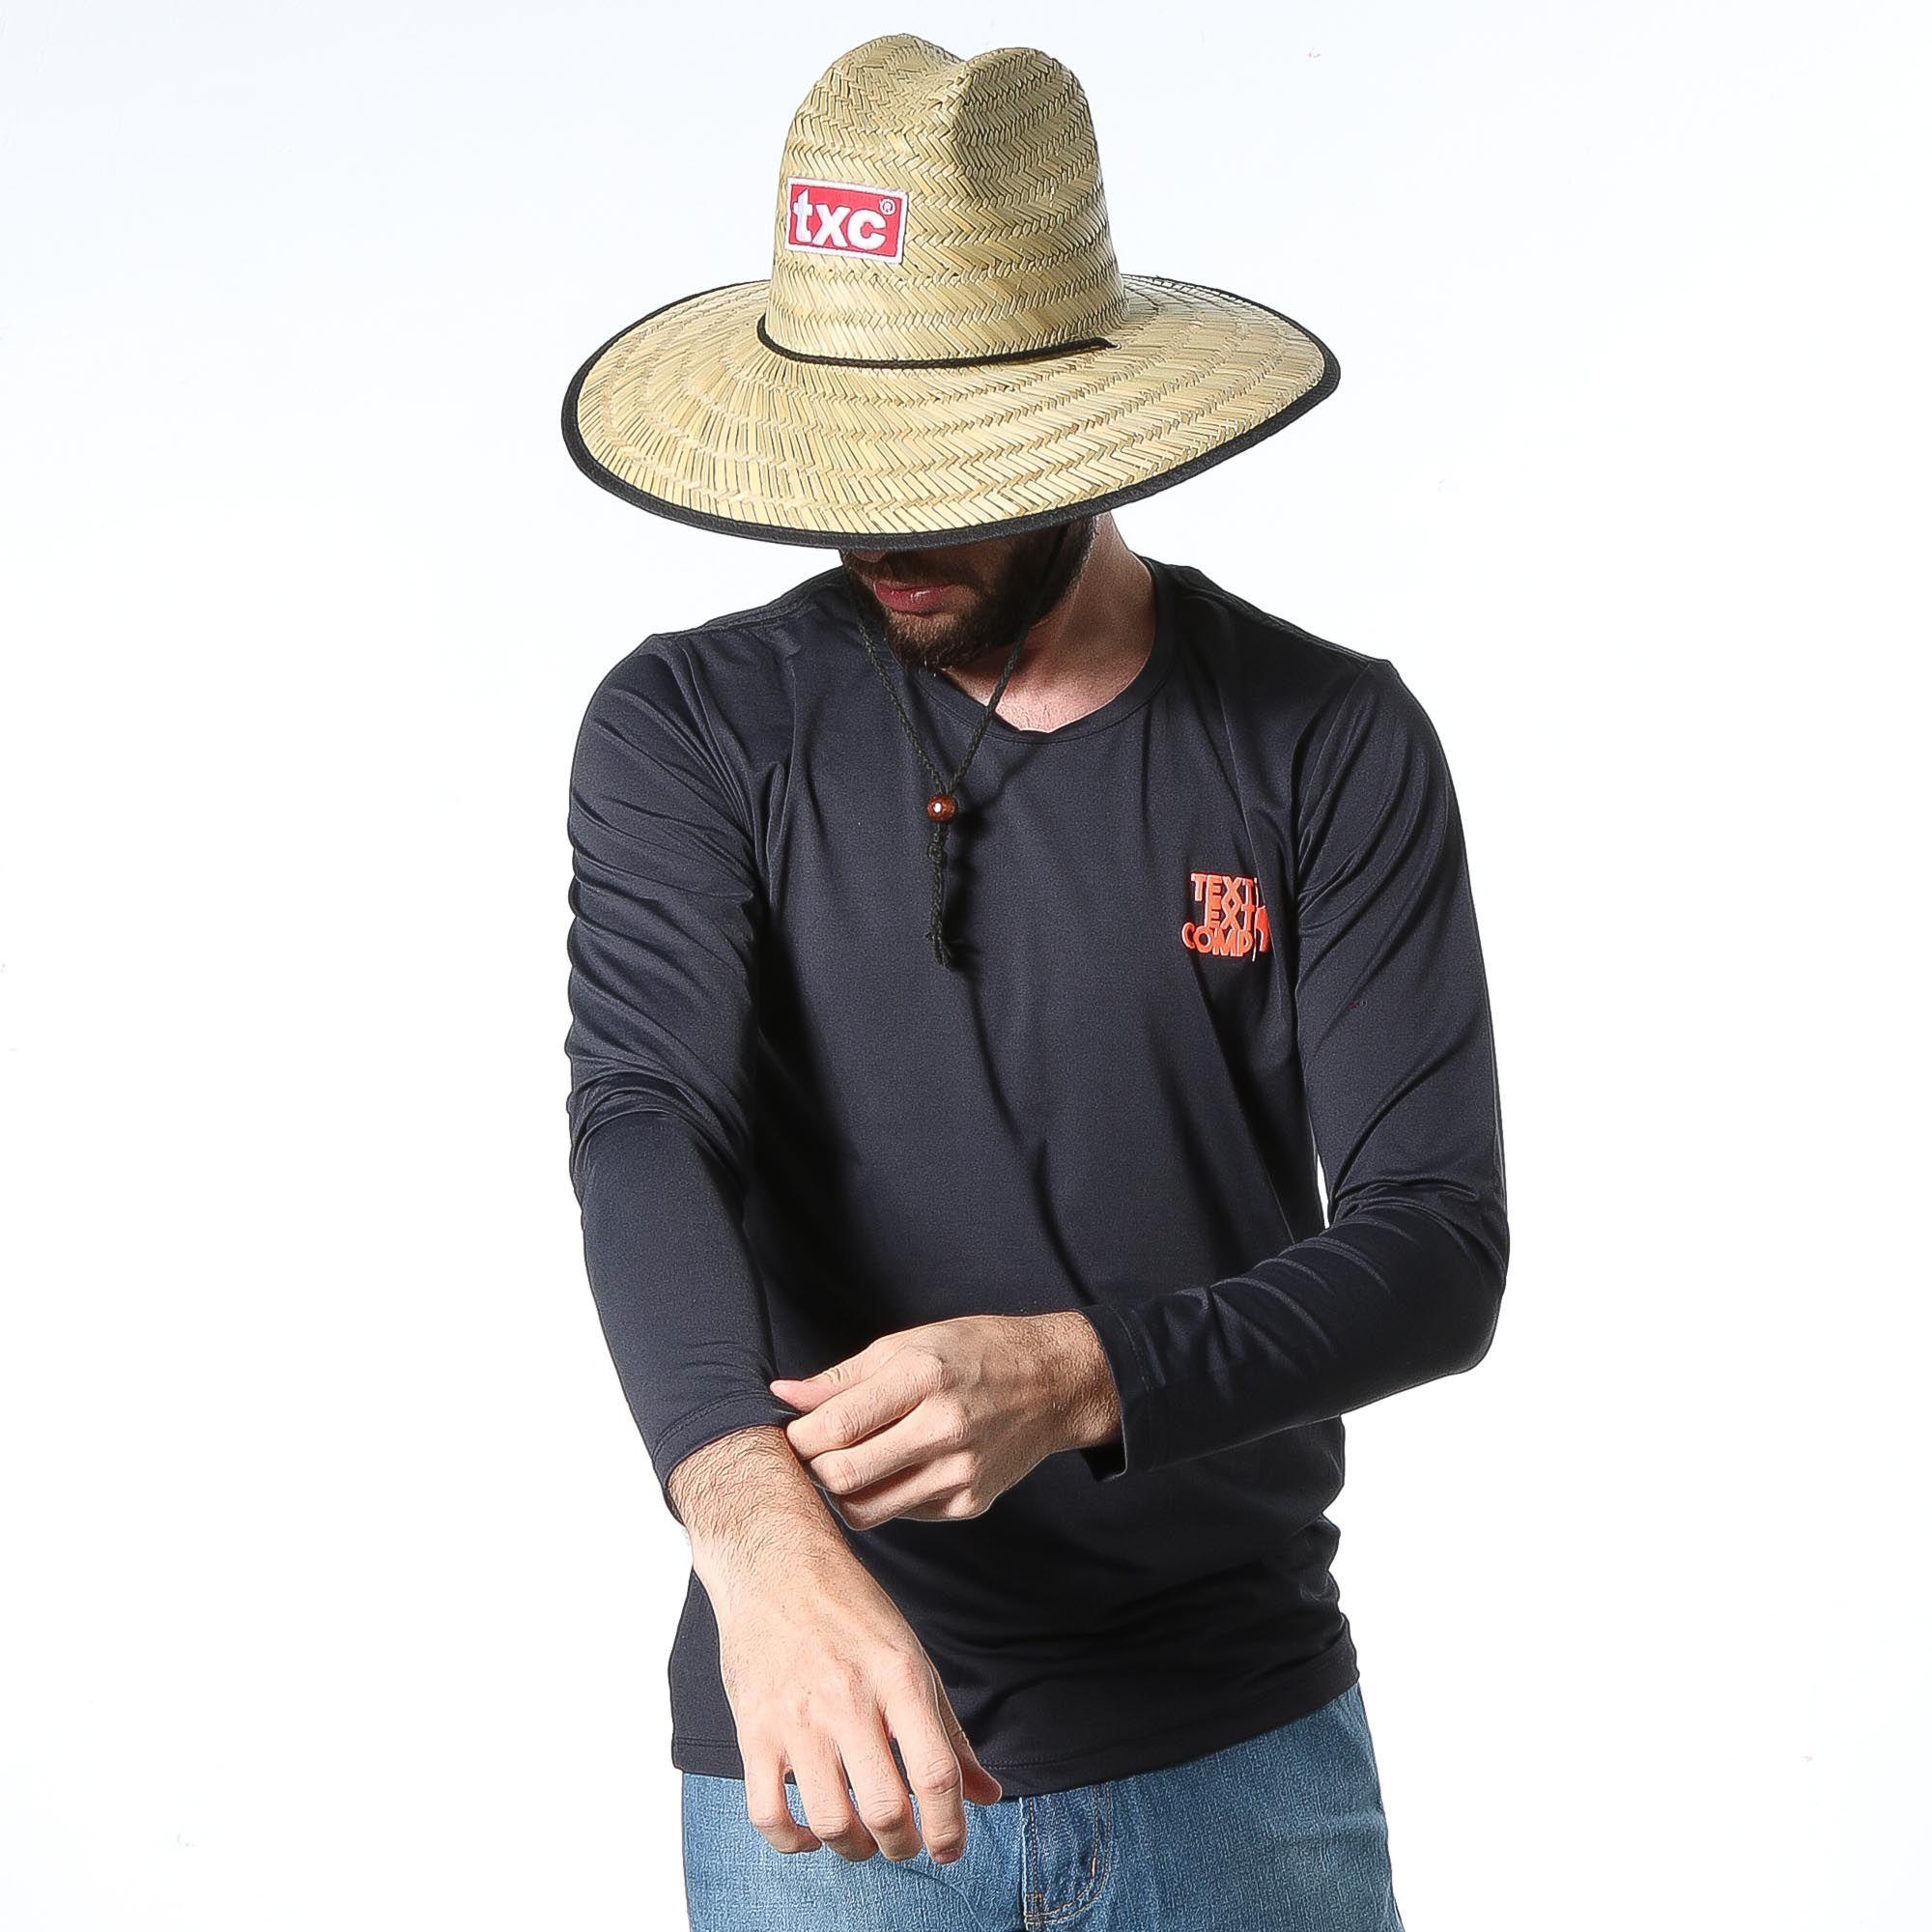 Camiseta Masculina TXC 1750